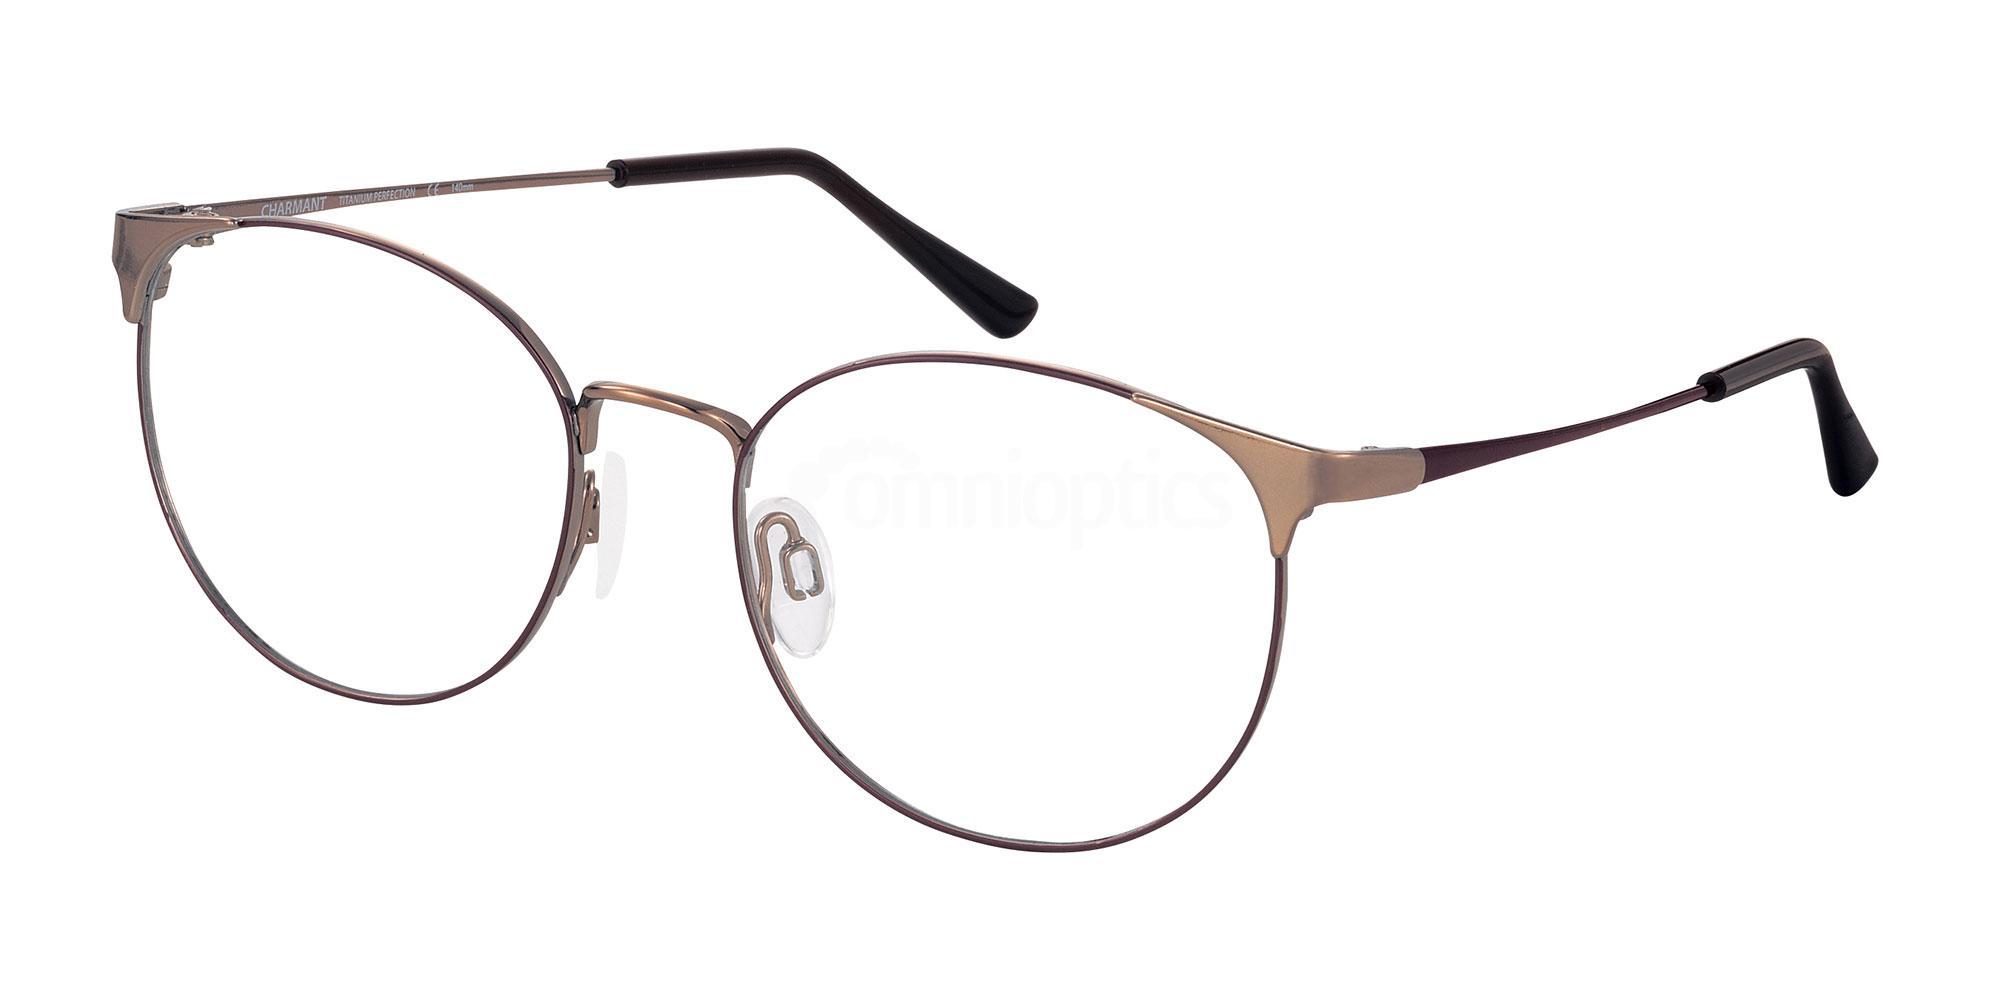 BR CH29806 Glasses, Charmant Titanium Perfection